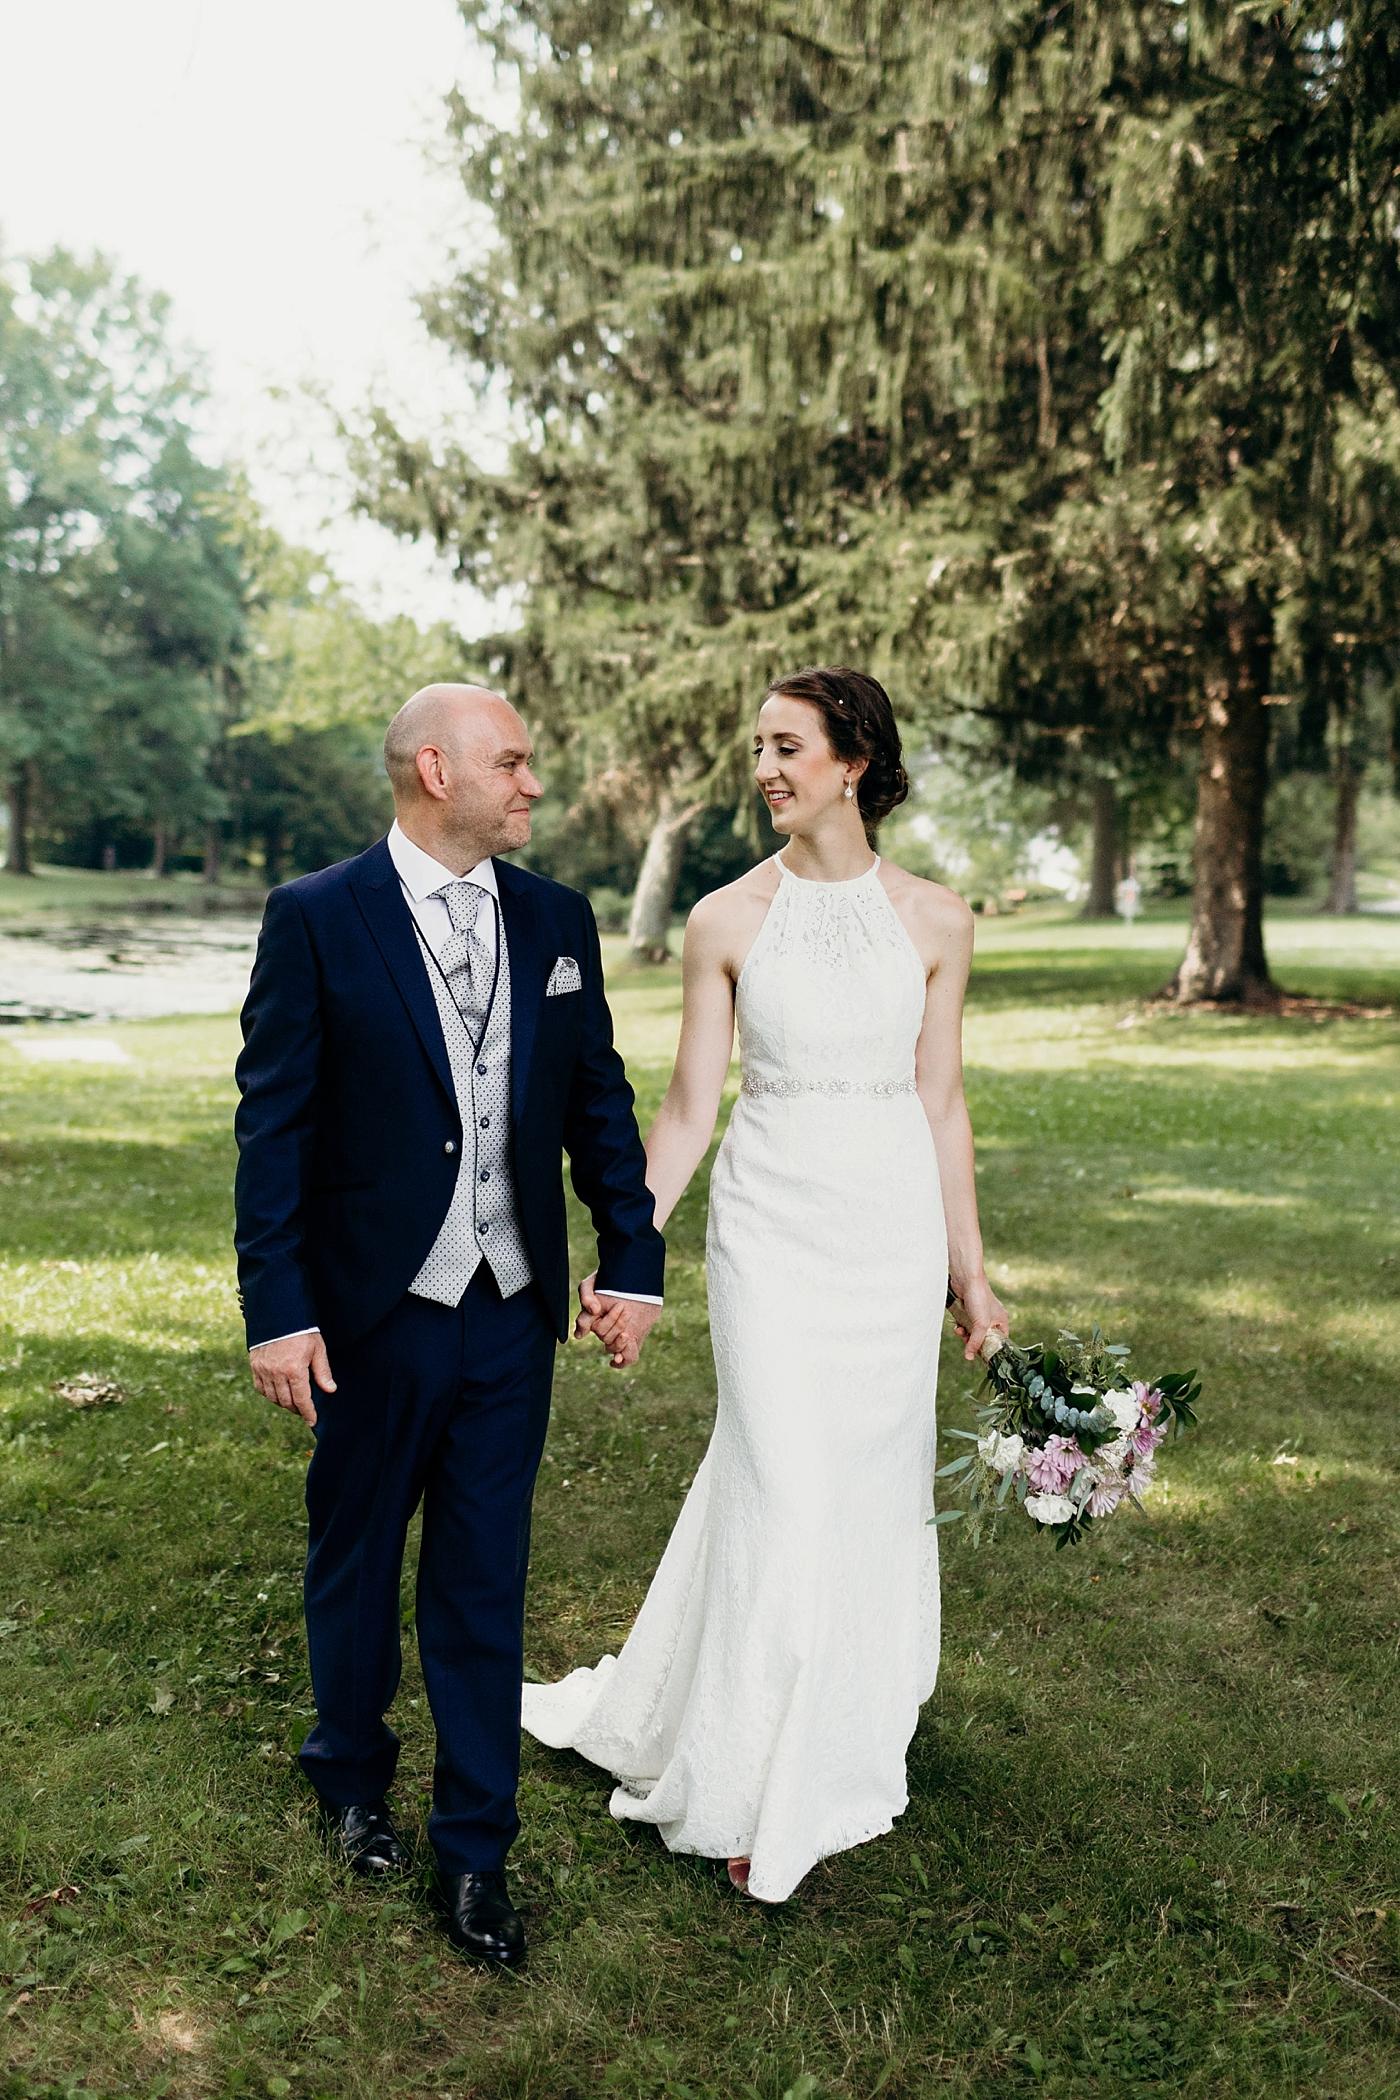 Chateau-Michelle-Wedding-Julia+JuanLuis_TheHeartlandersCo2018LP-46.jpg